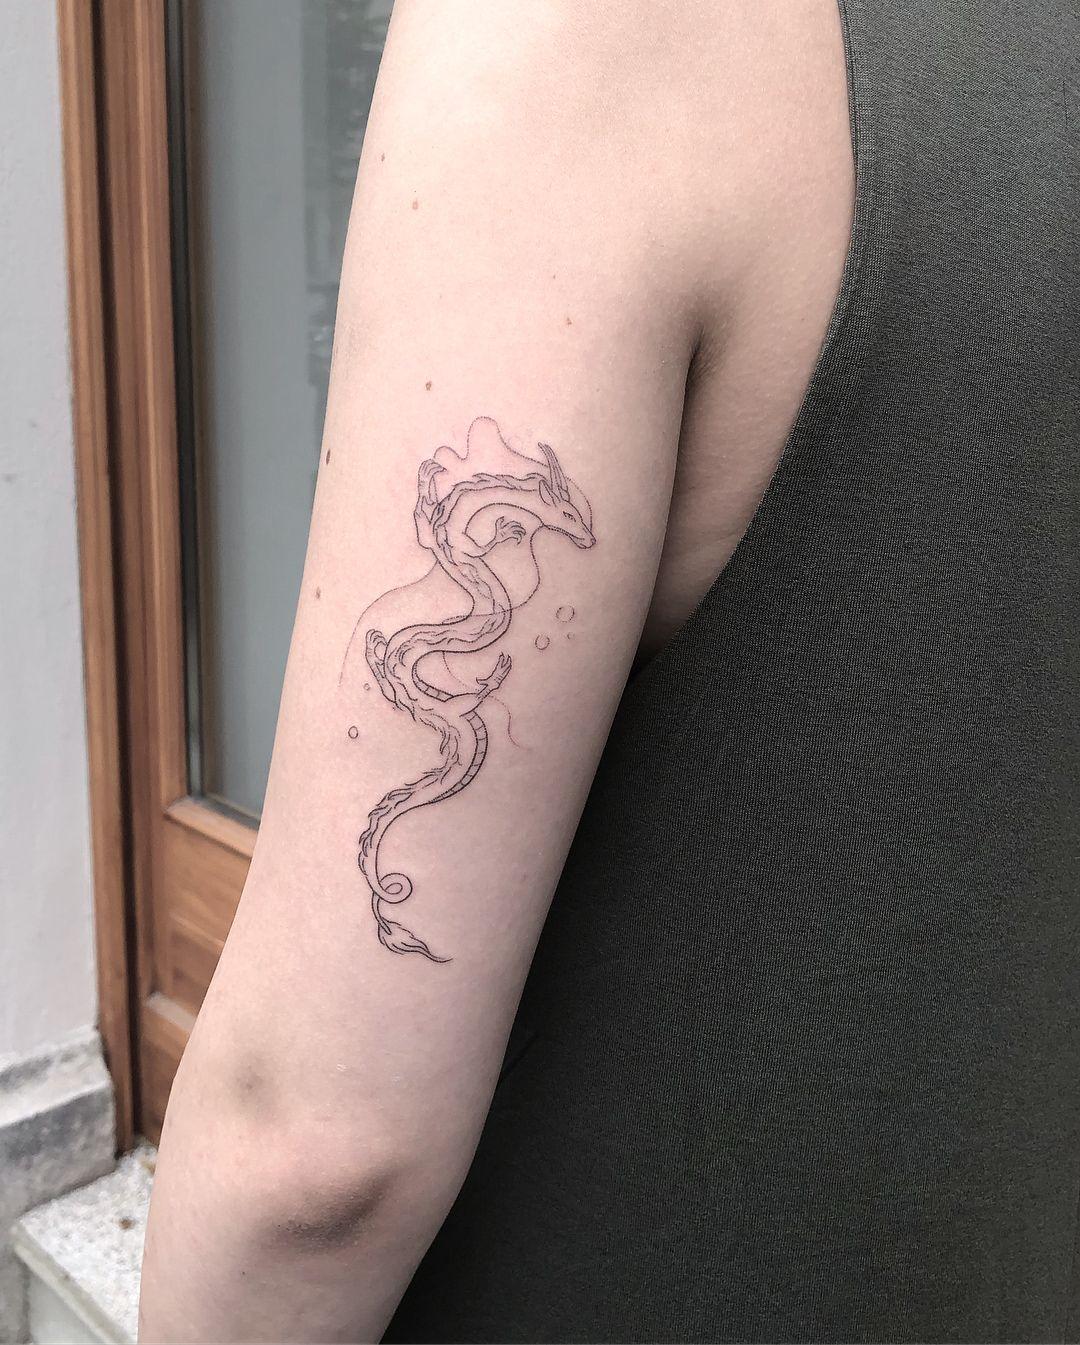 Haku For Clara Thank You So Much Spiritedaway Hakutattoo Tattoos Dragon Tattoo For Women Spirited Away Tattoo